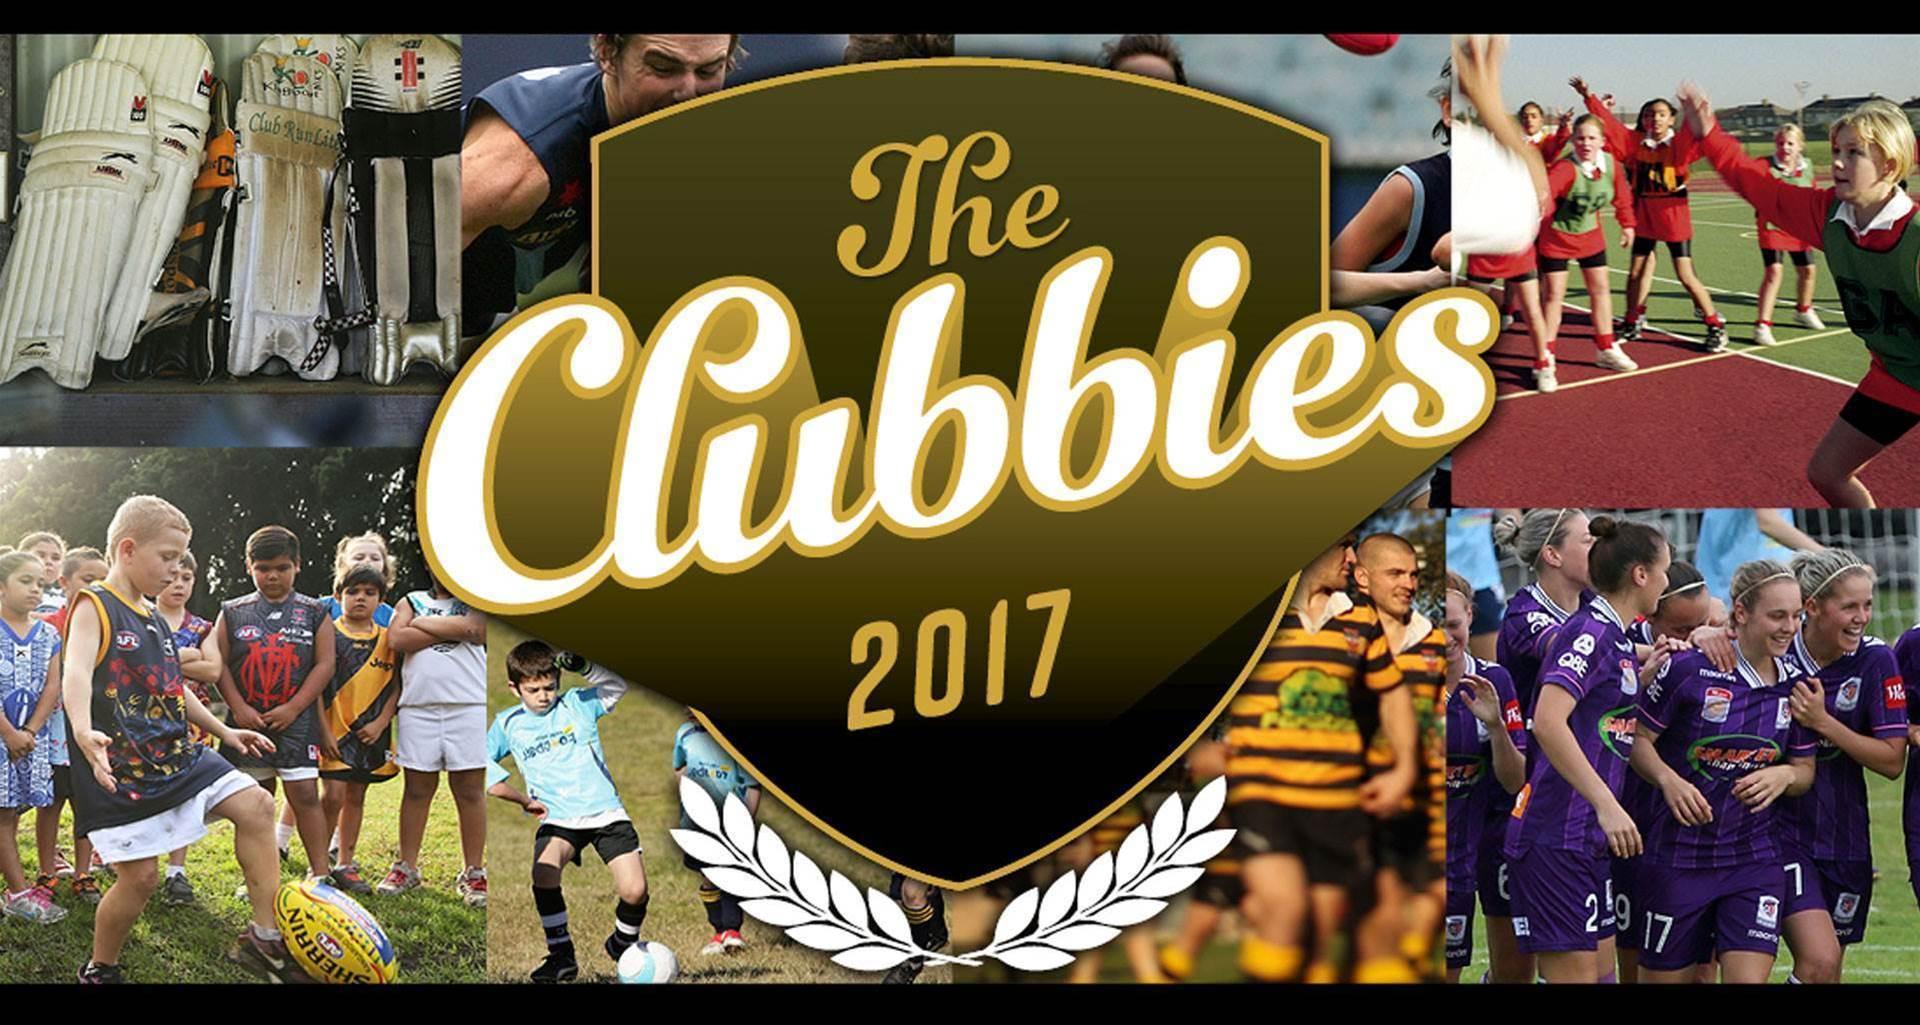 Clubbies winners announcement